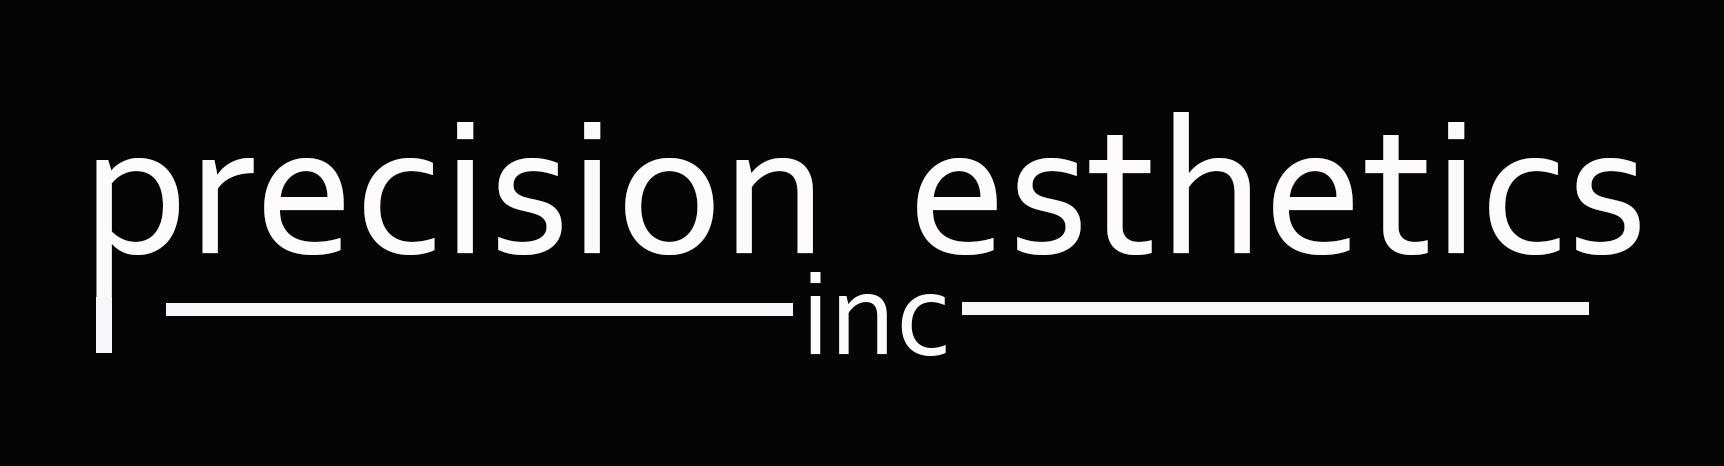 Precision Esthetics Inc